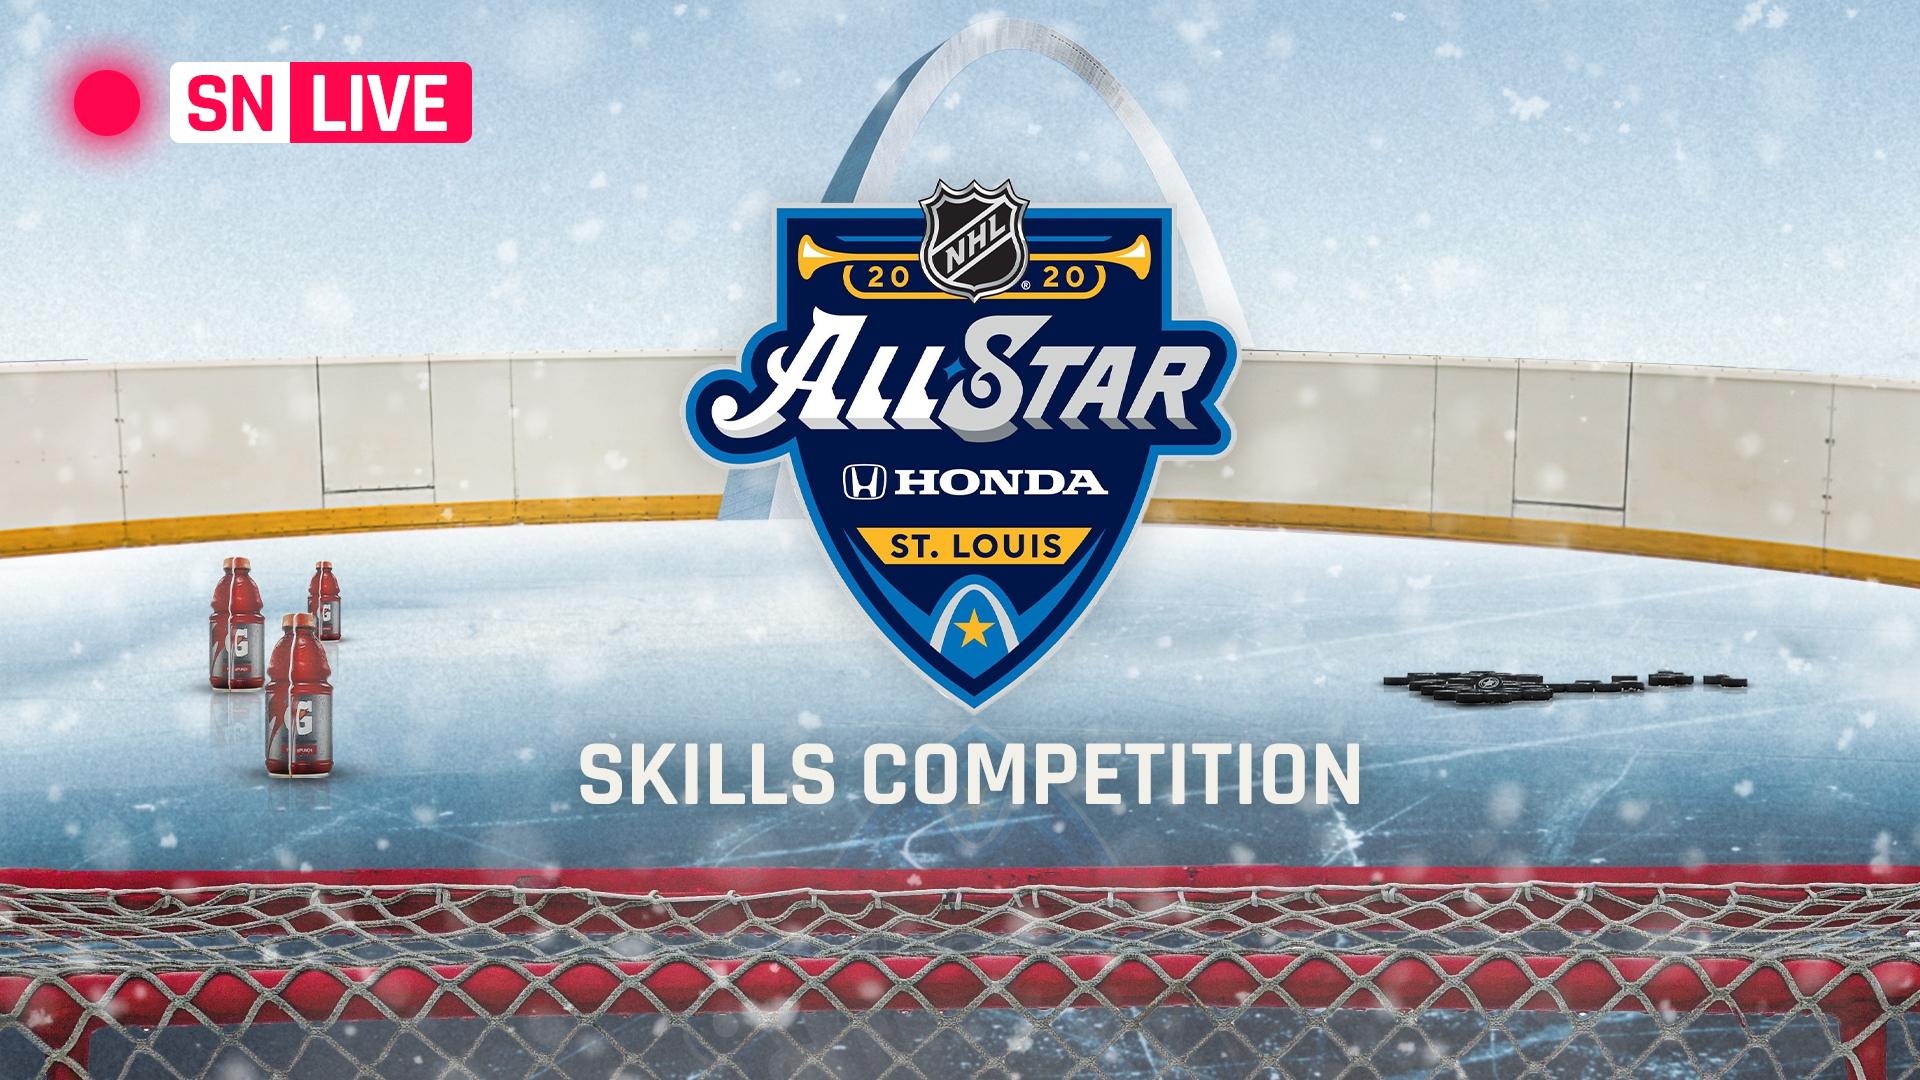 Nhl-all-star-skills-competition-live-blog-ftr_1hat2s52pelex10i5hx03upm9a